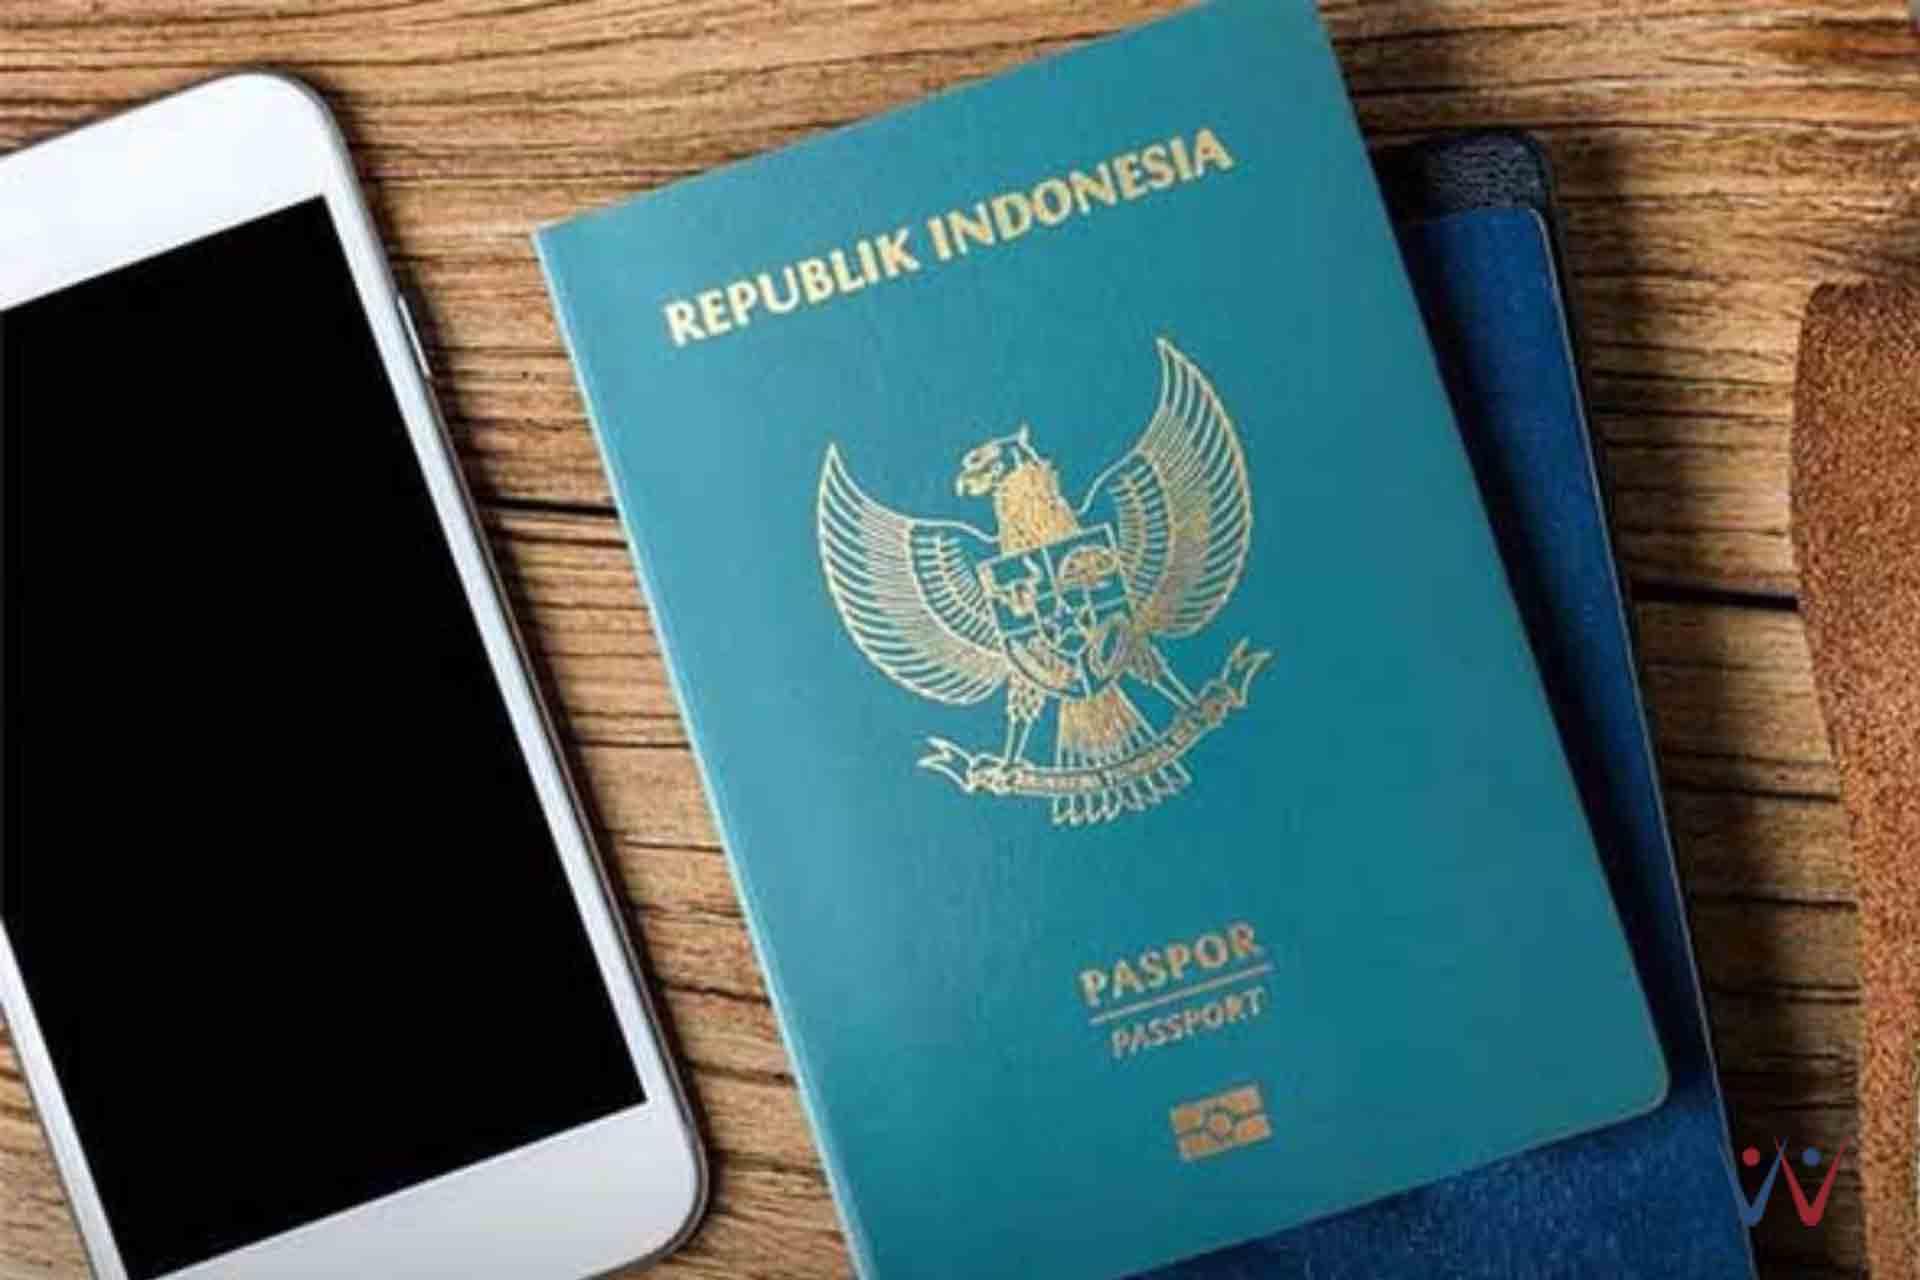 daftar paspor onlien - antrian paspor online - perpanjang paspor online - 5